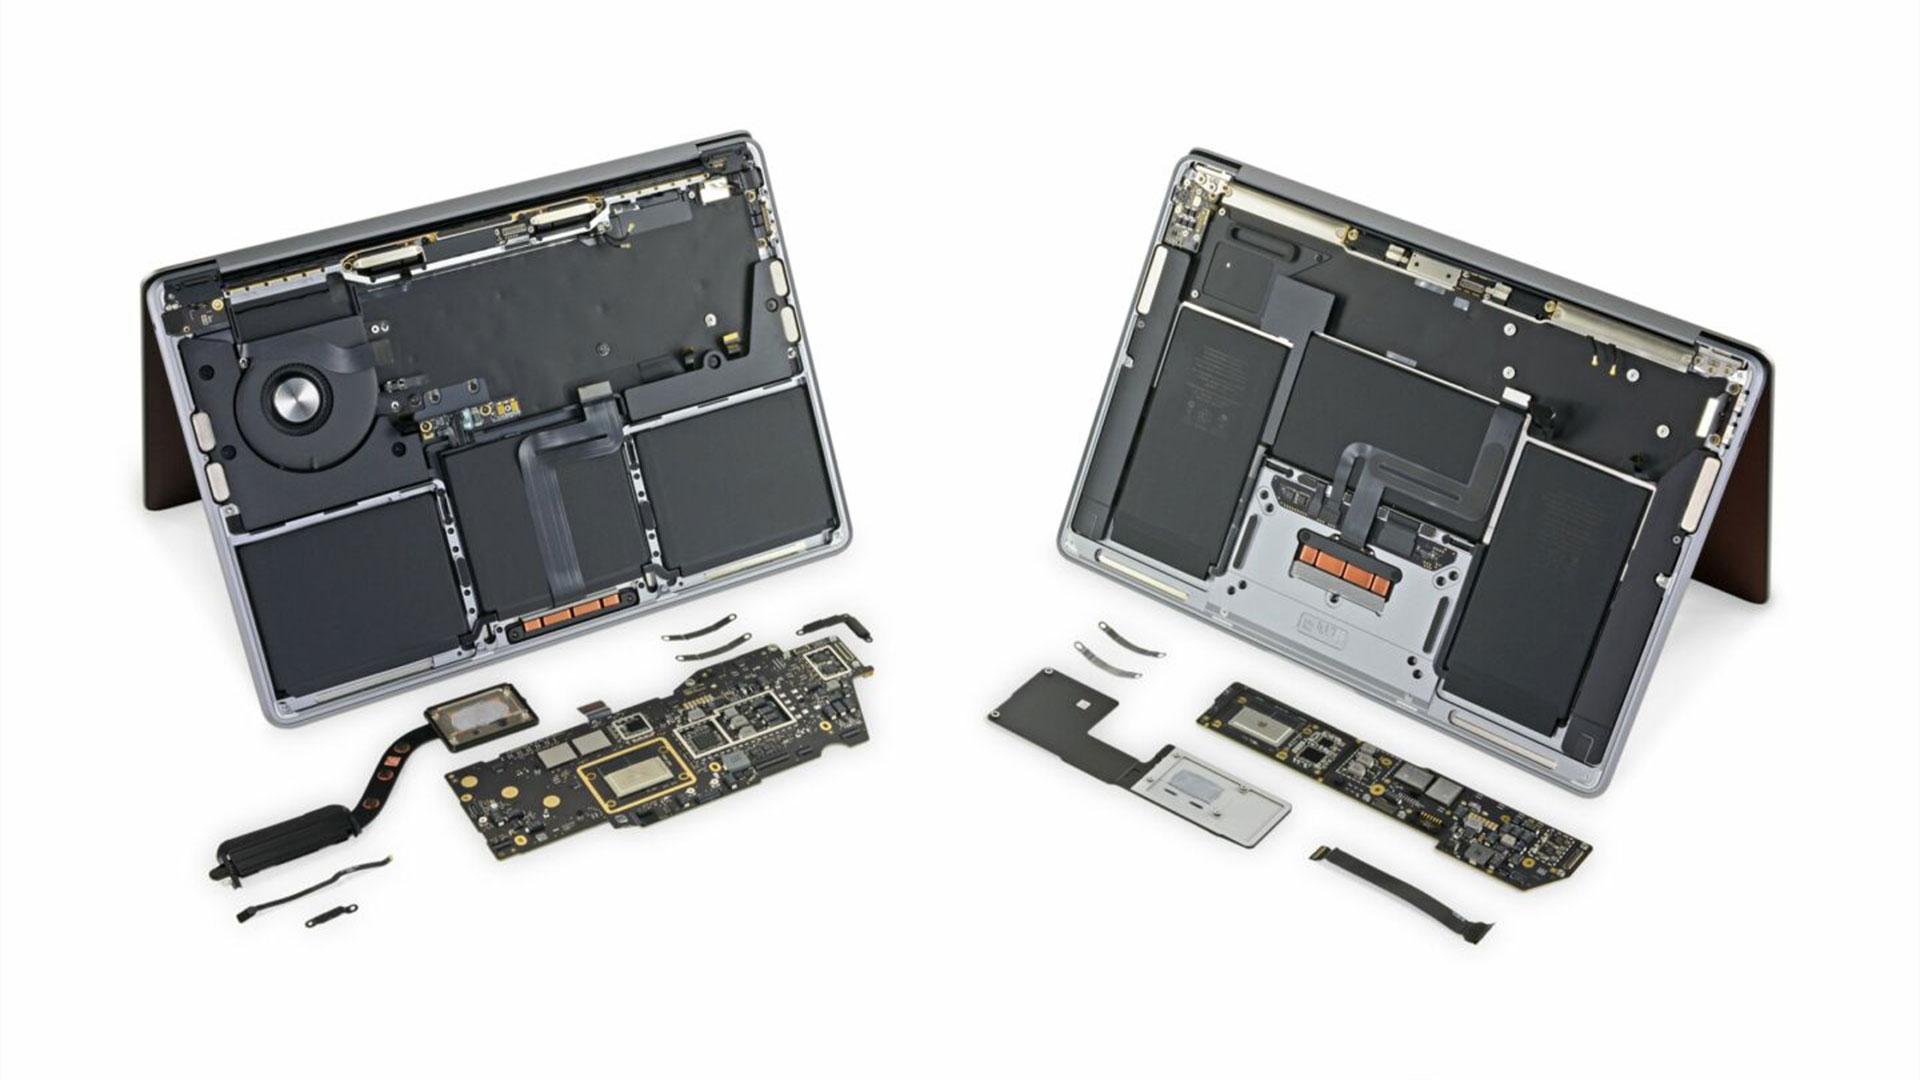 iFixit, M1 MacBook'a Yakindan Bakmamiza Olanak Sagliyor4